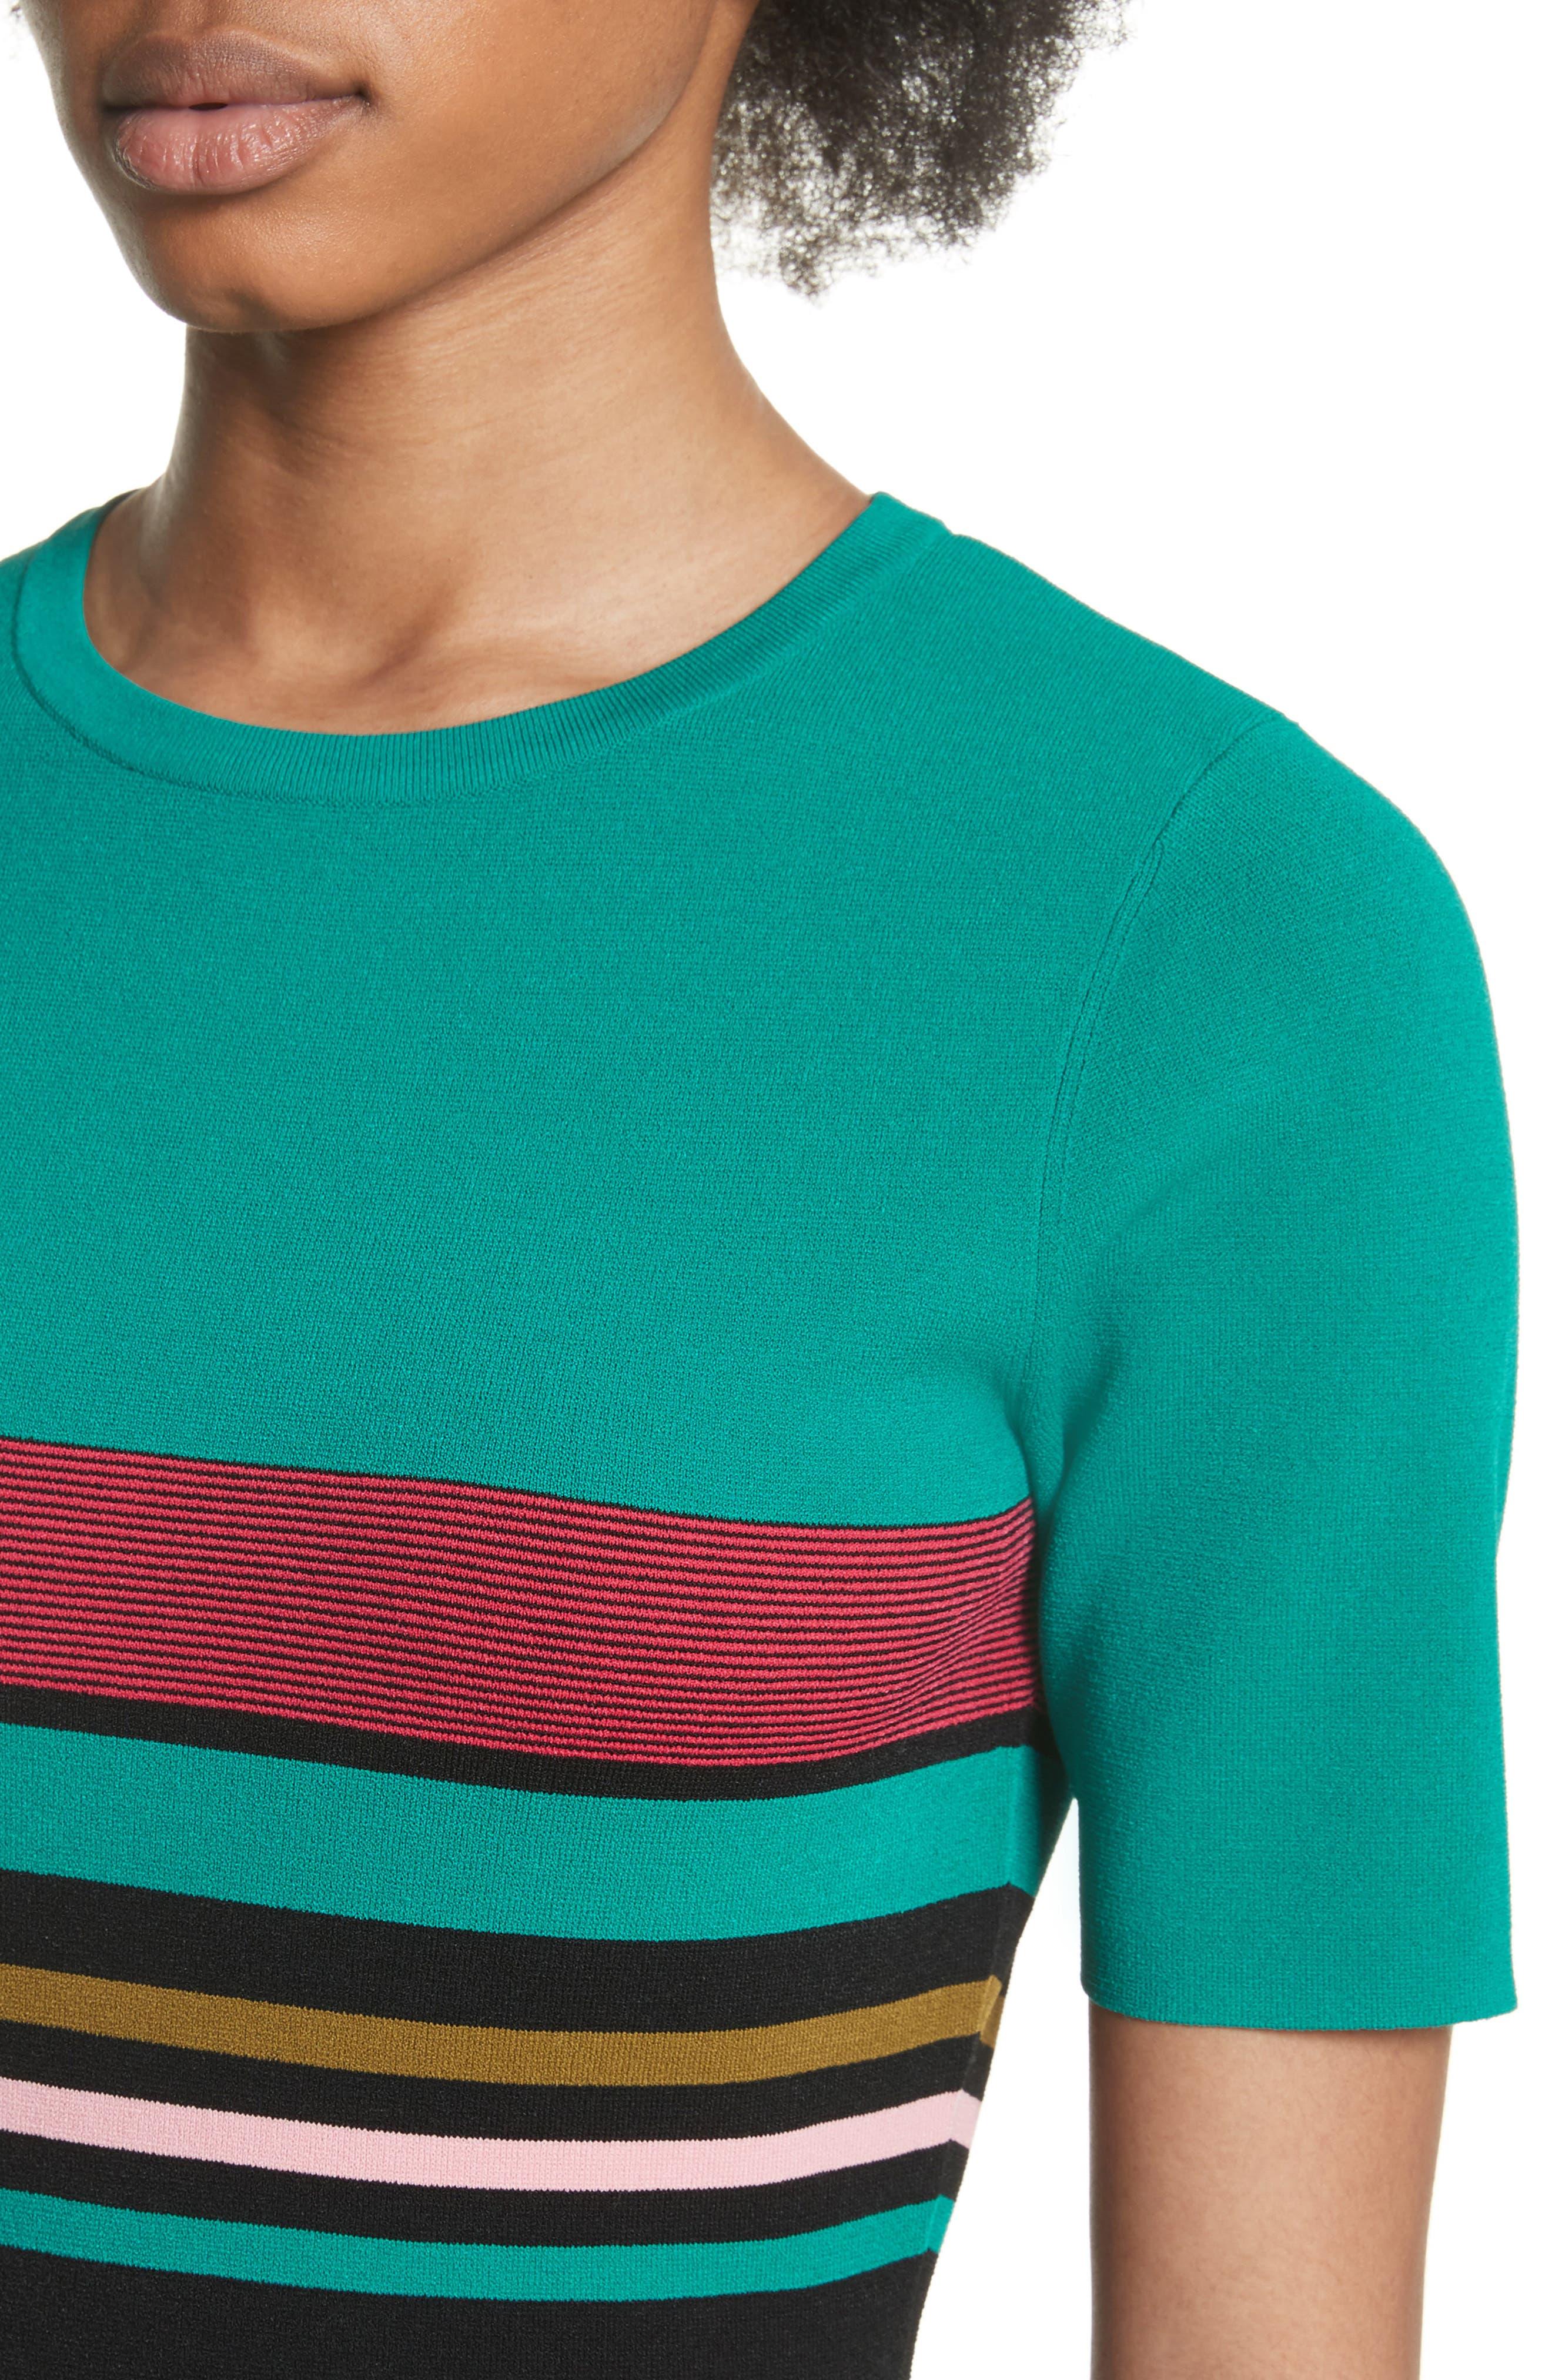 Diane von Furstenberg Stripe Short Sleeve Sweater Dress,                             Alternate thumbnail 4, color,                             Juniper Multi